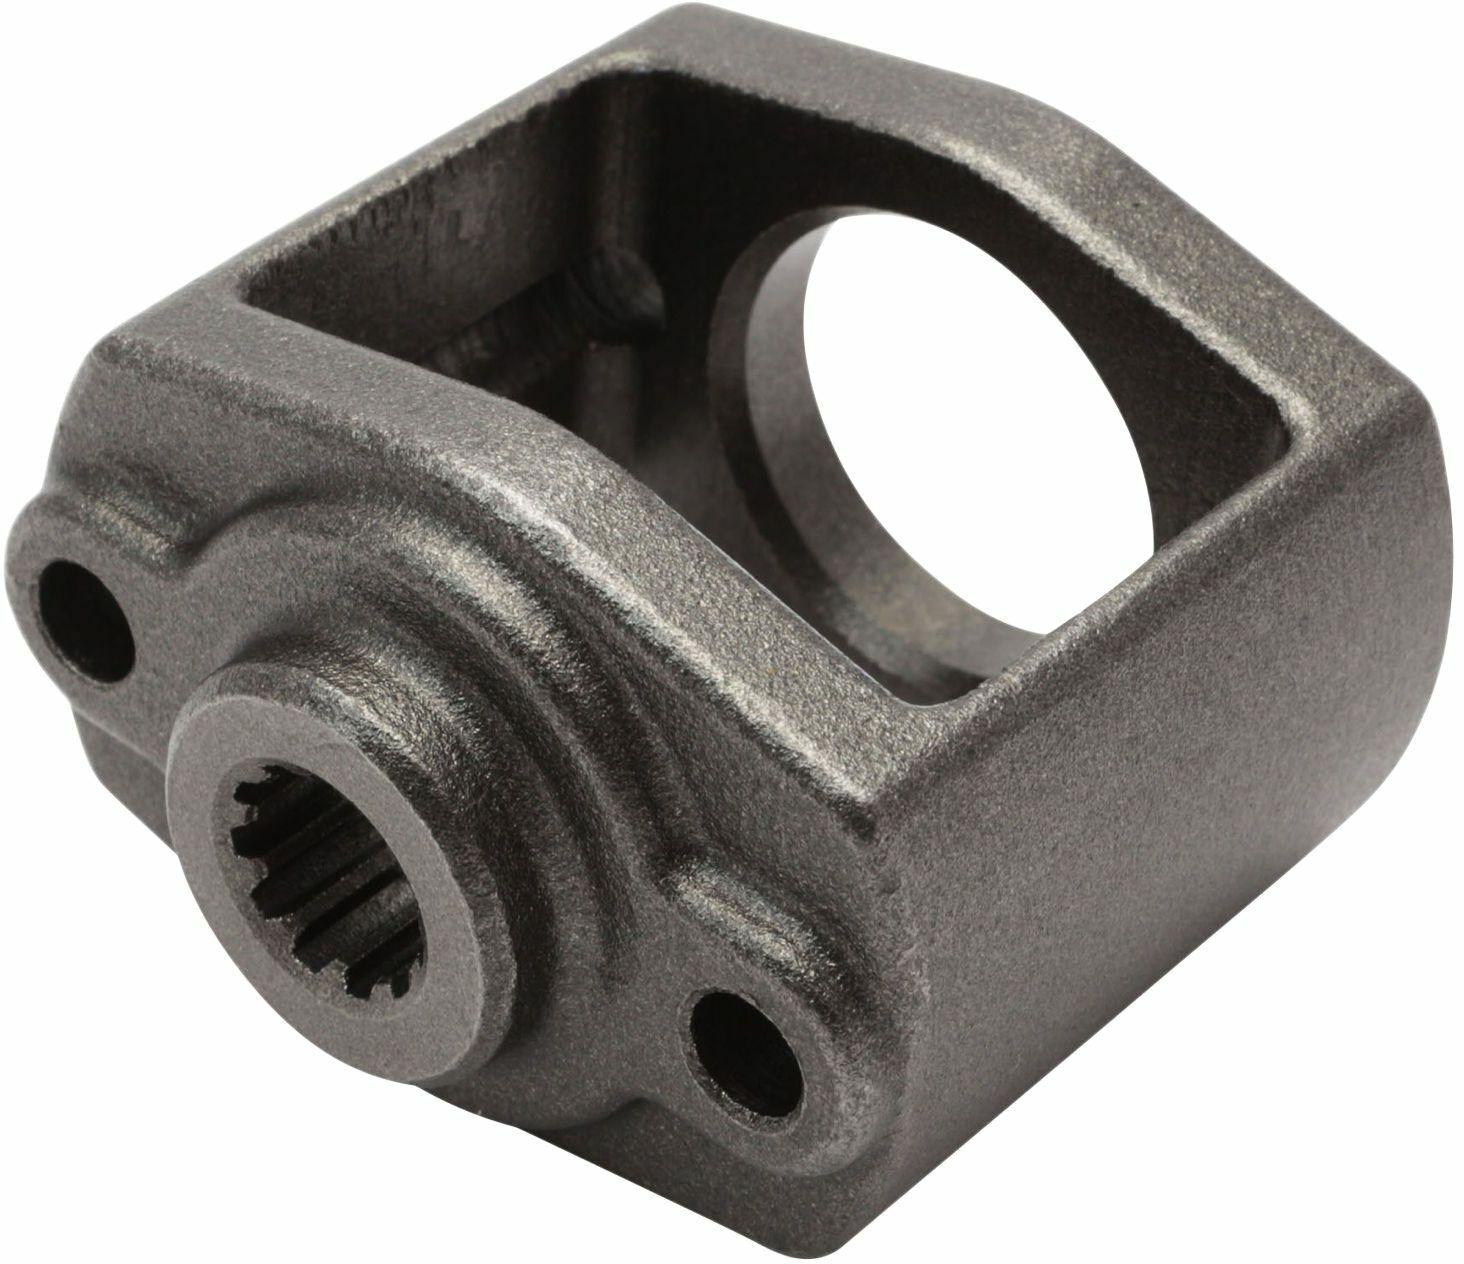 HAZET Striking mechanism frame 9012-1SPC-011